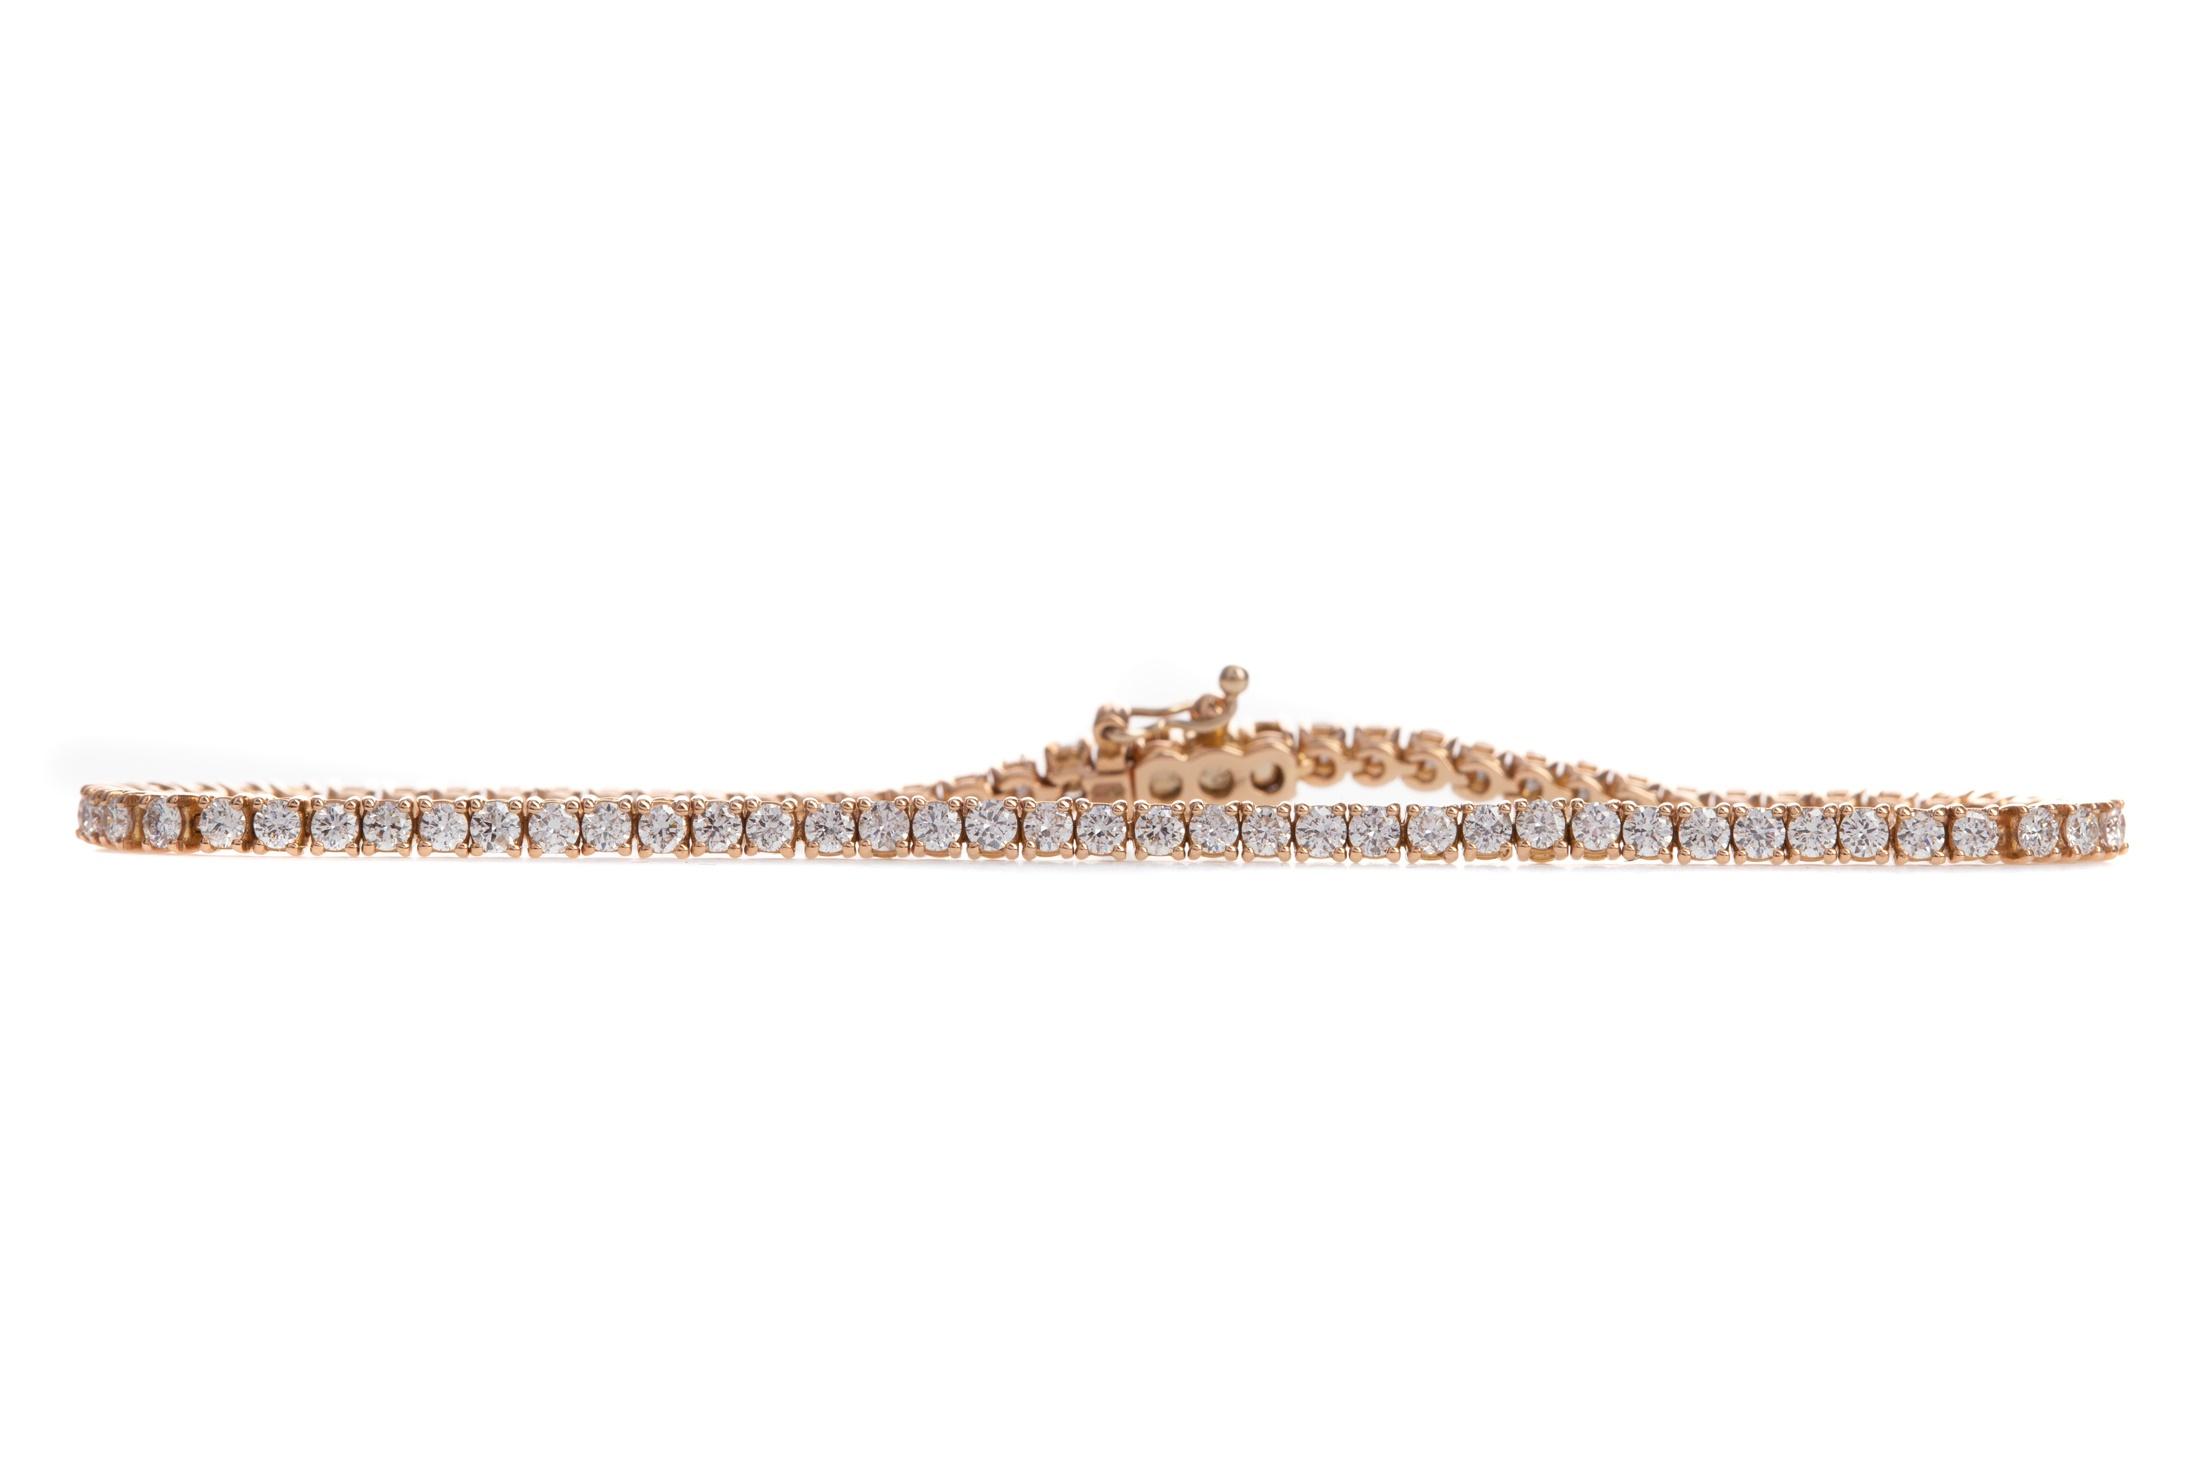 A ROSE GOLD DIAMOND TENNIS BRACELET